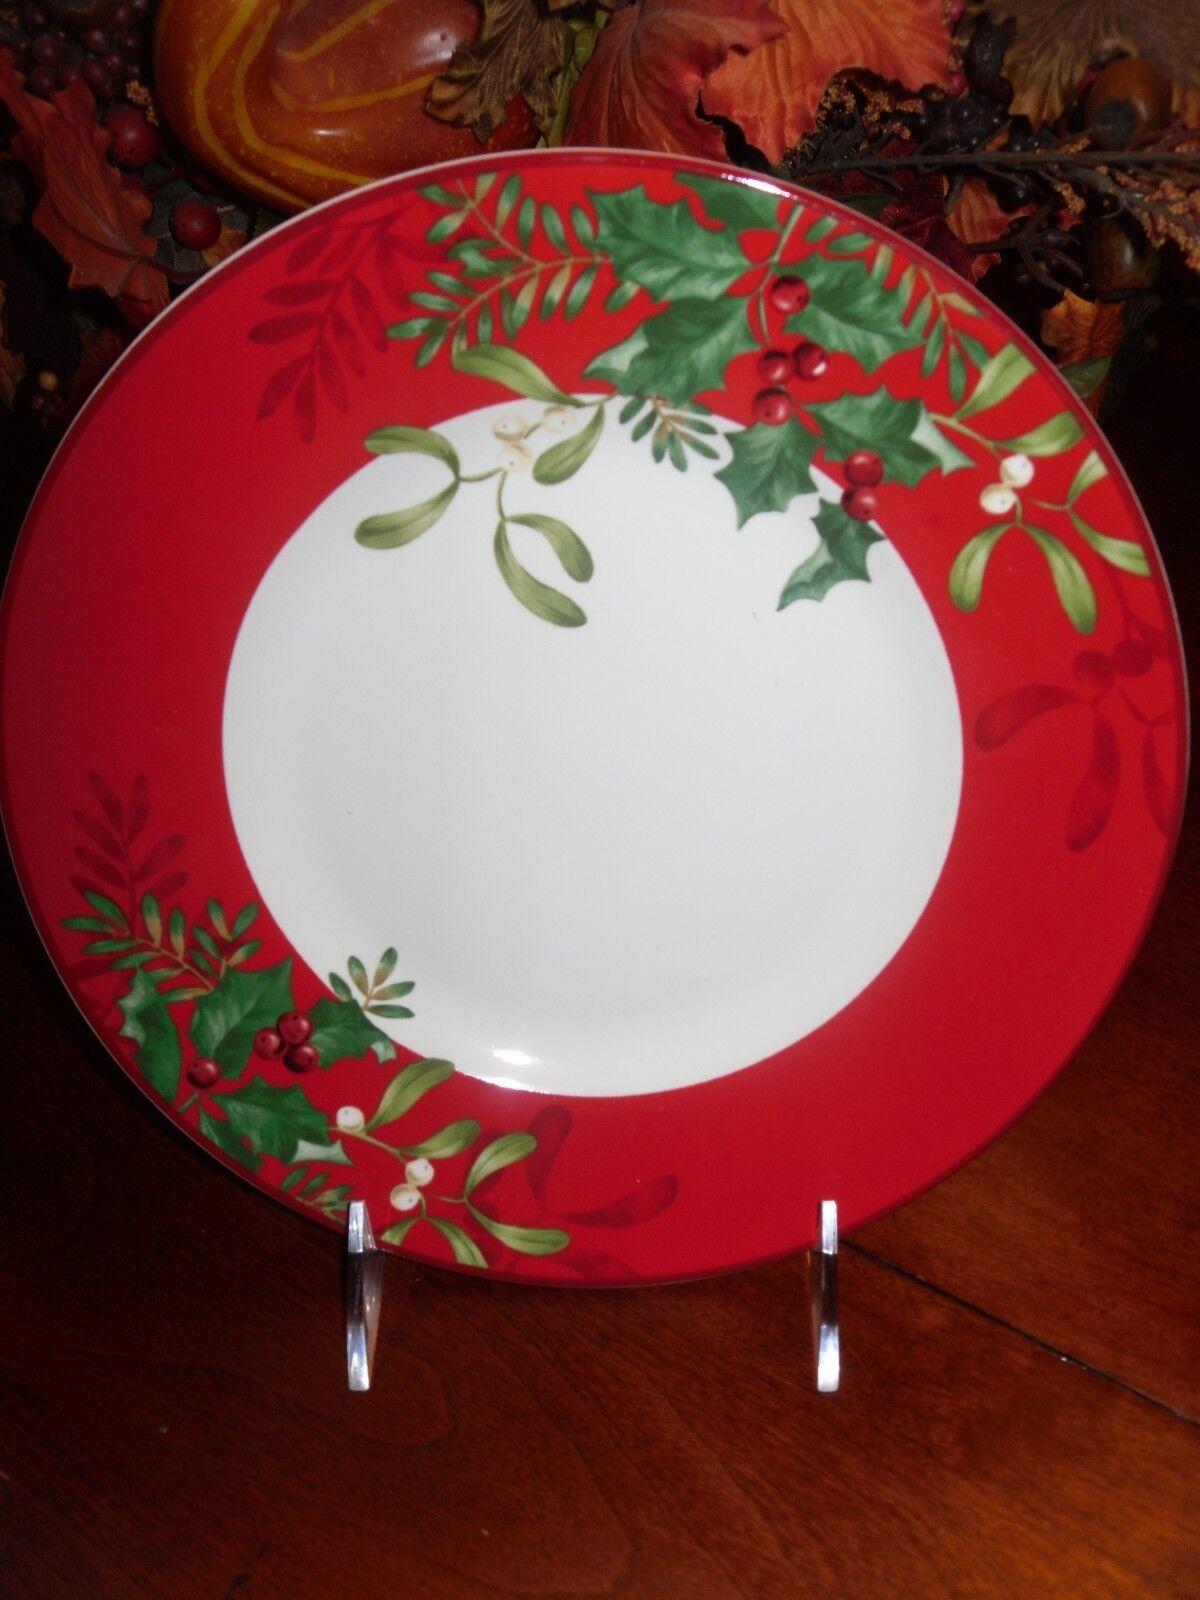 222 FIFTH CHRISTMAS FOLIAGE SET 4 rot SALAD PLATES PORCELAIN MISTLETON HOLLY NEW